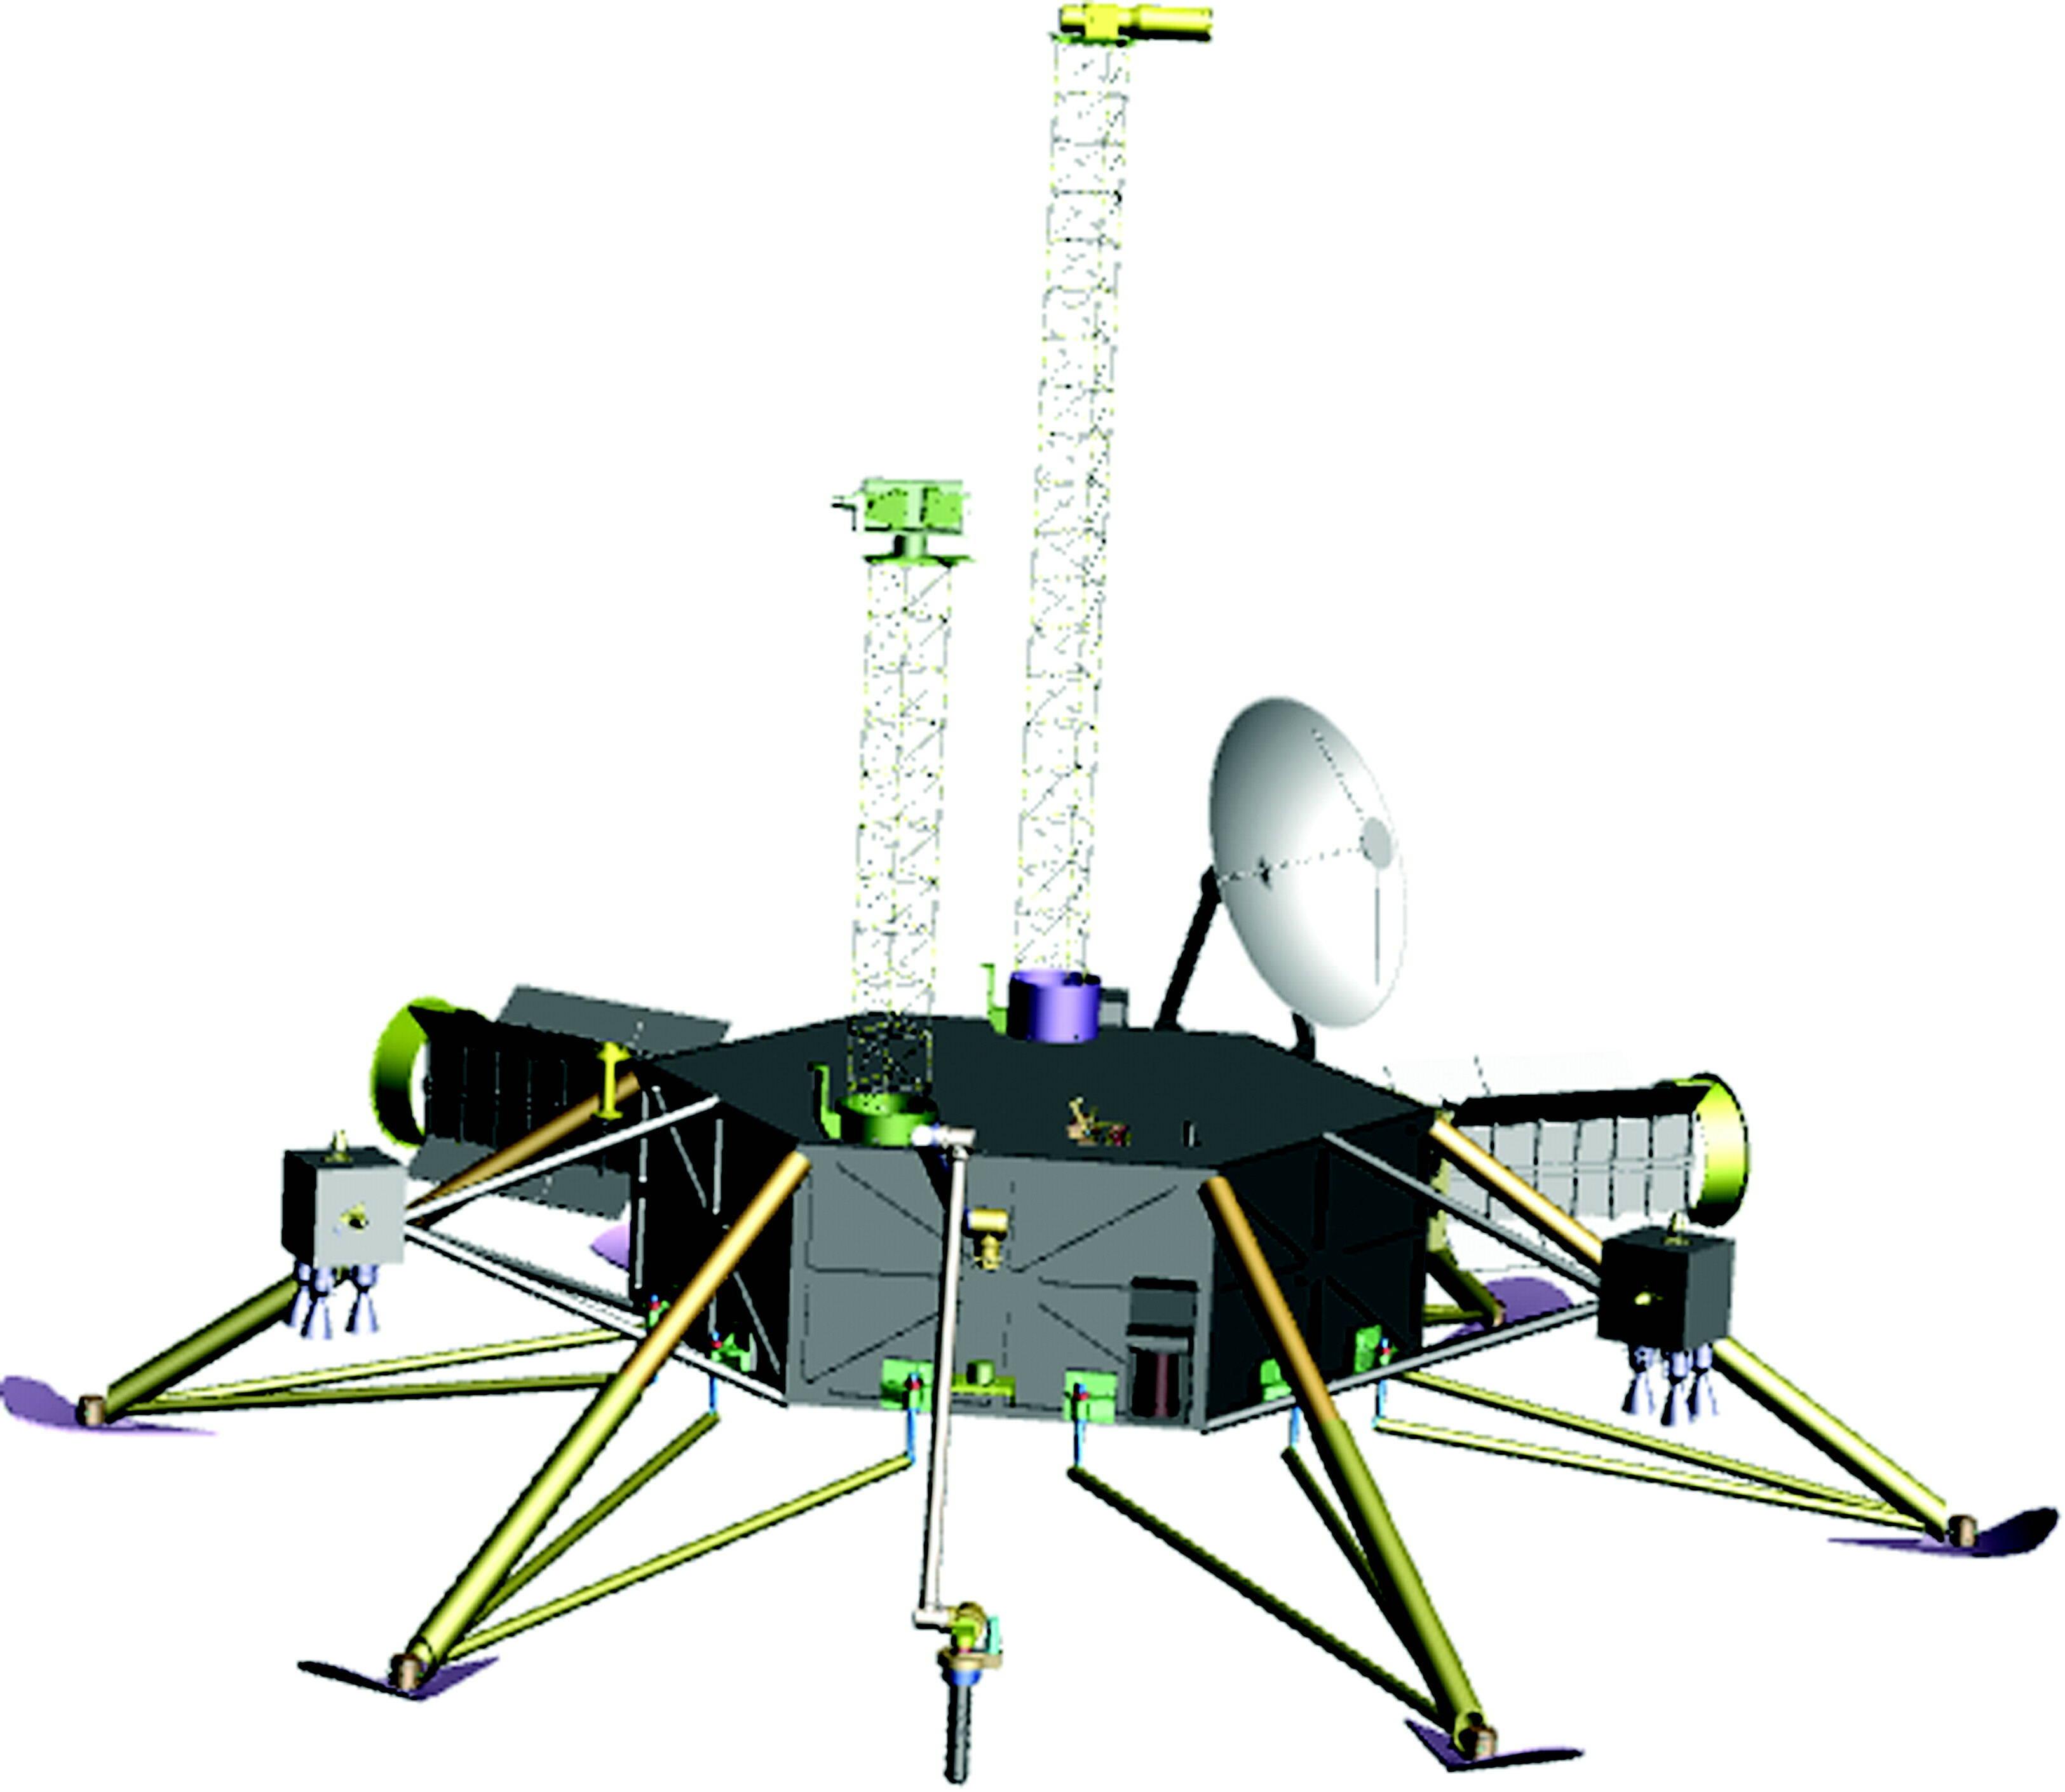 NASA's sketch of a future Europa lander